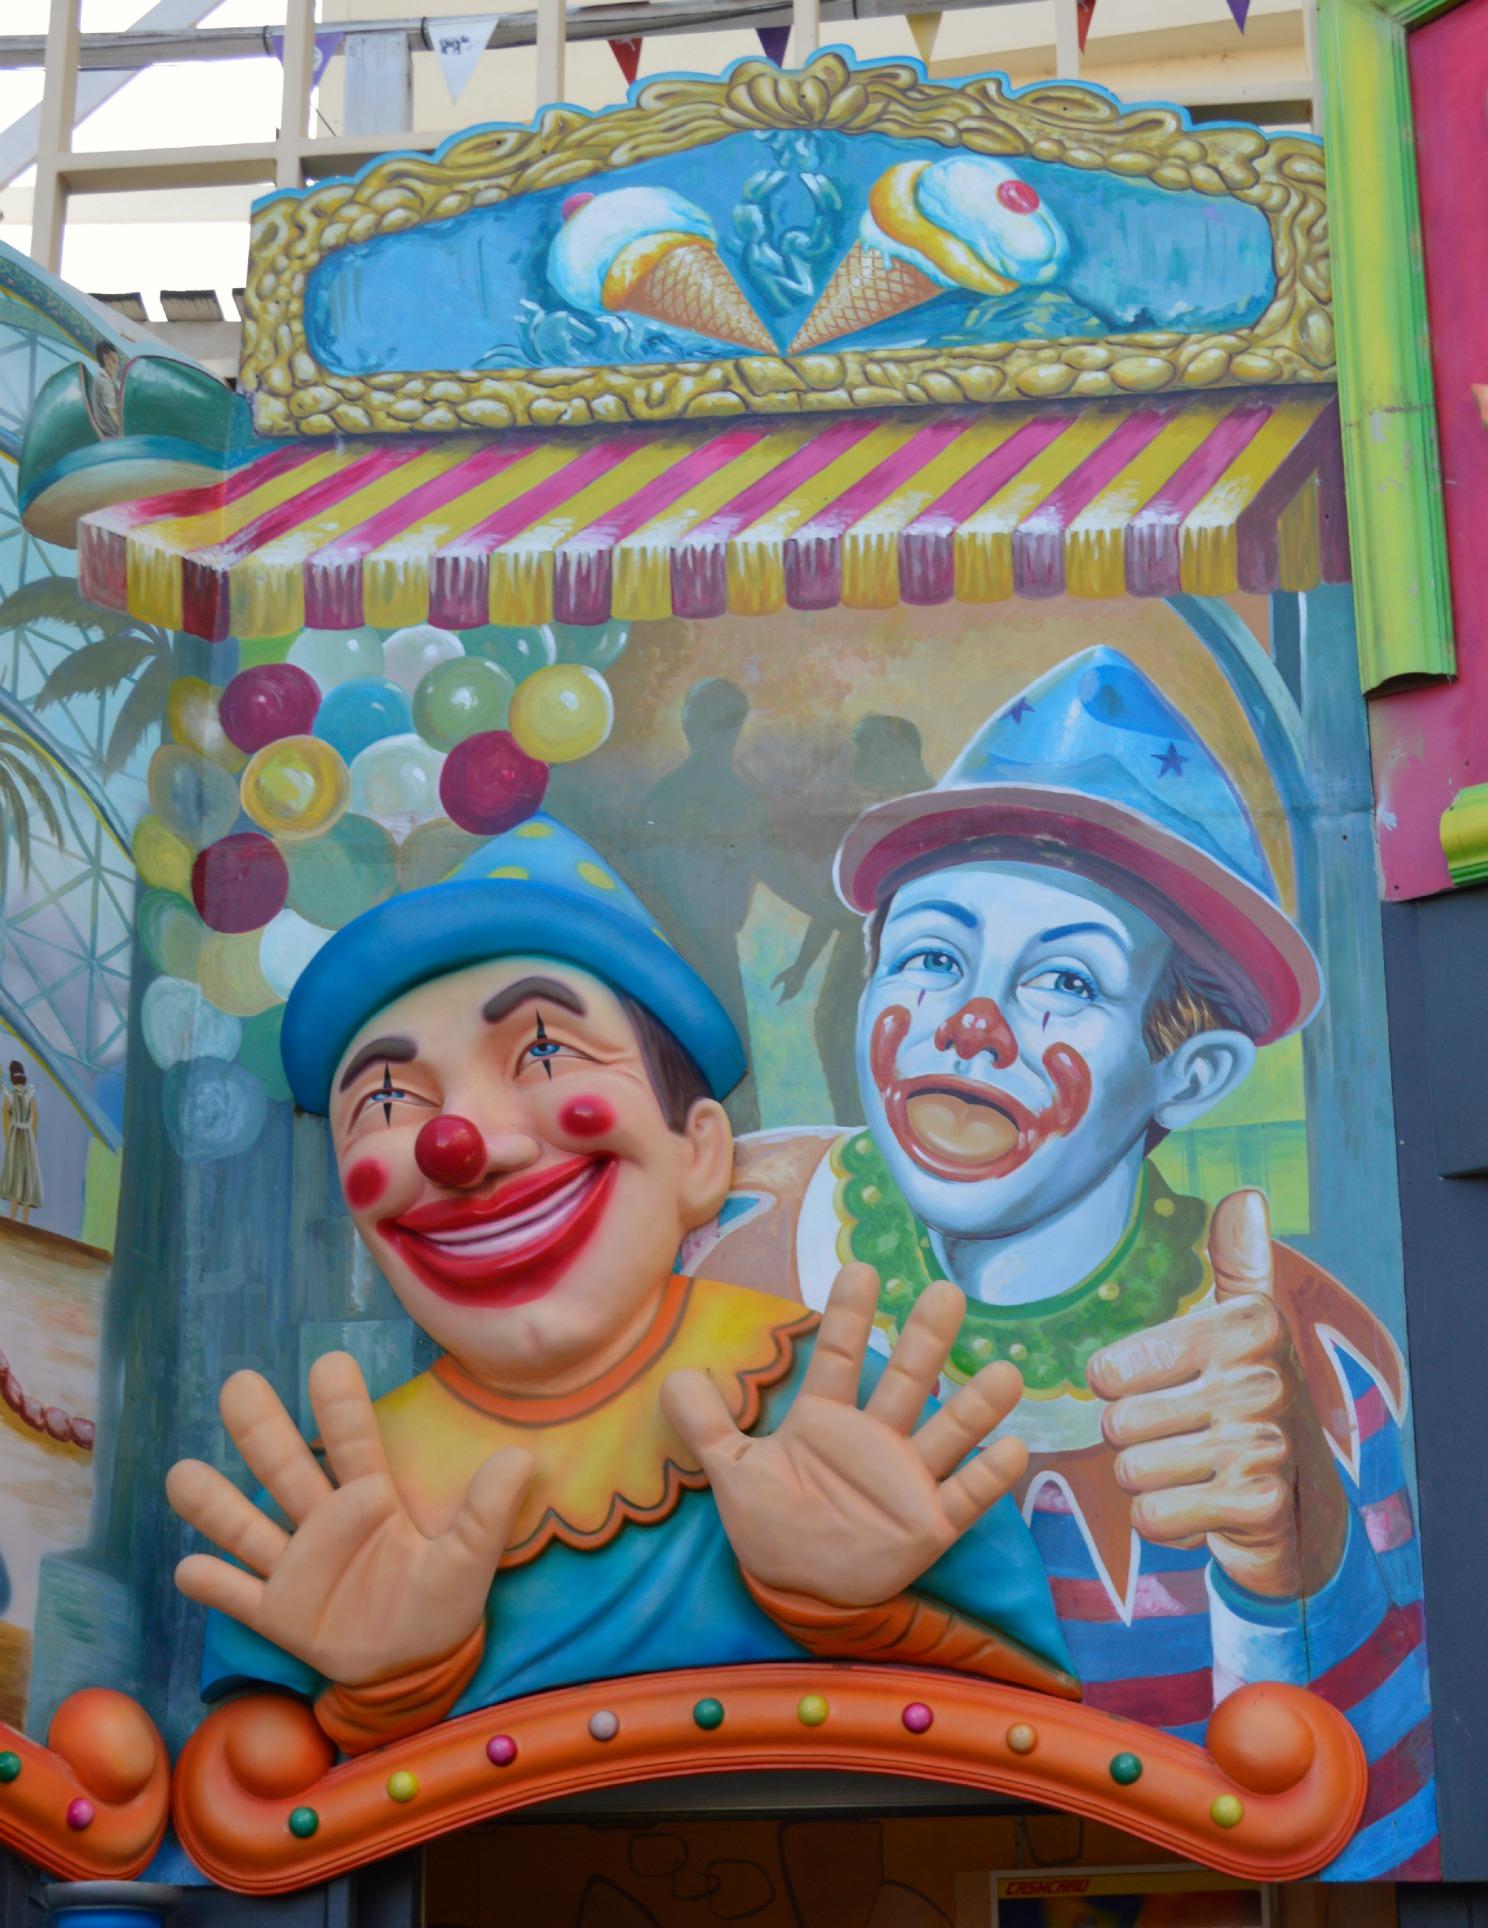 #Clown #kitsch #Haloween #Berlin